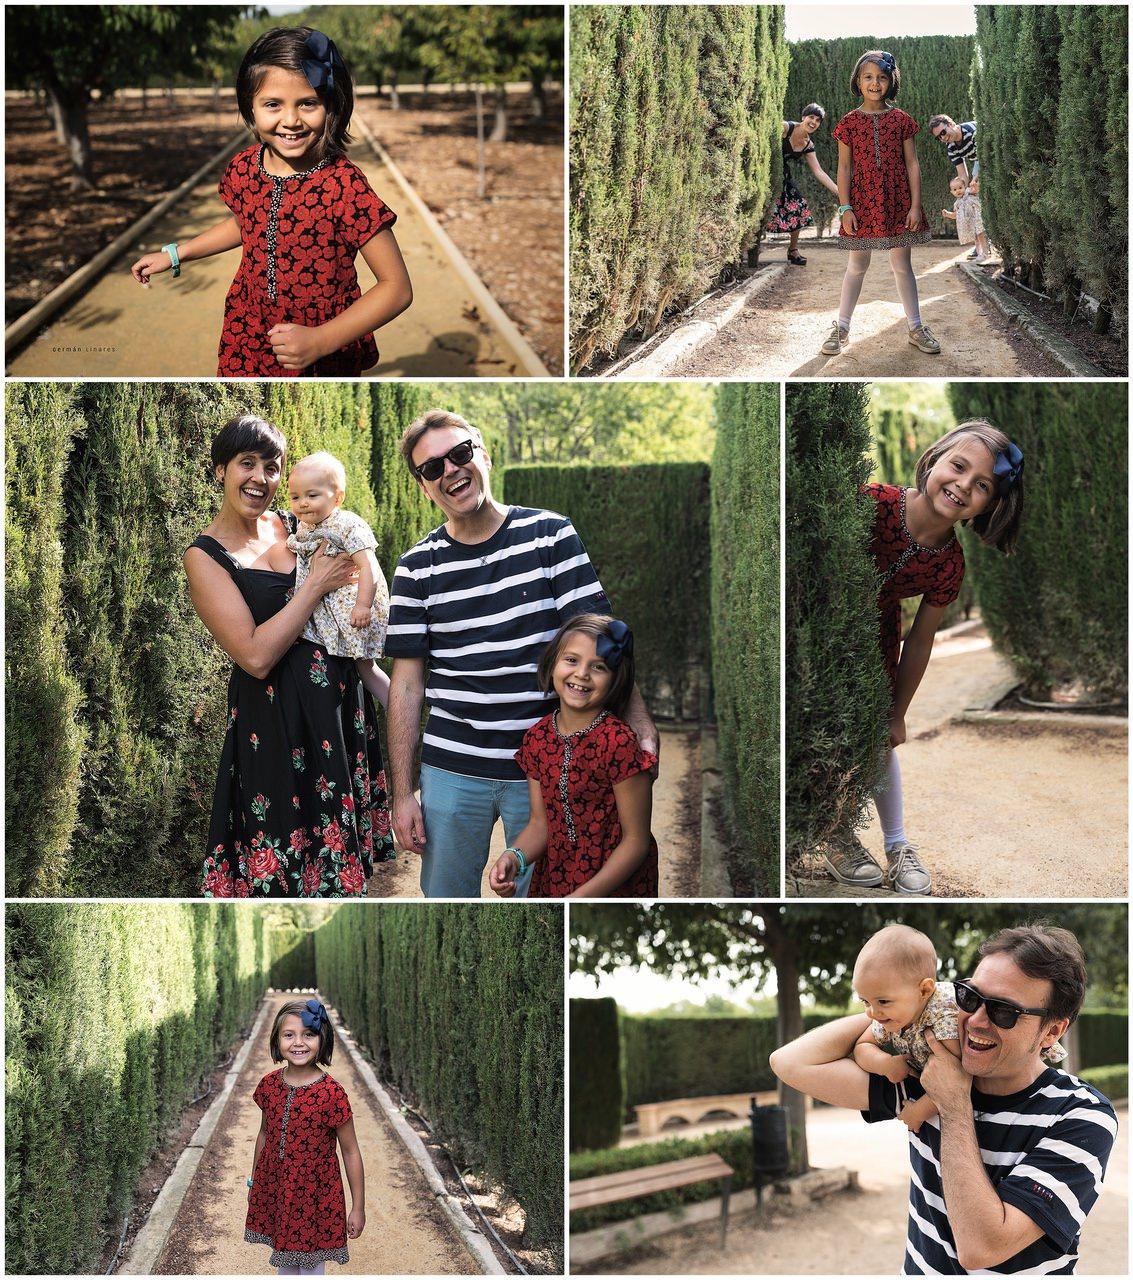 fotografo de bodas en alcoy, fotos familia onil6